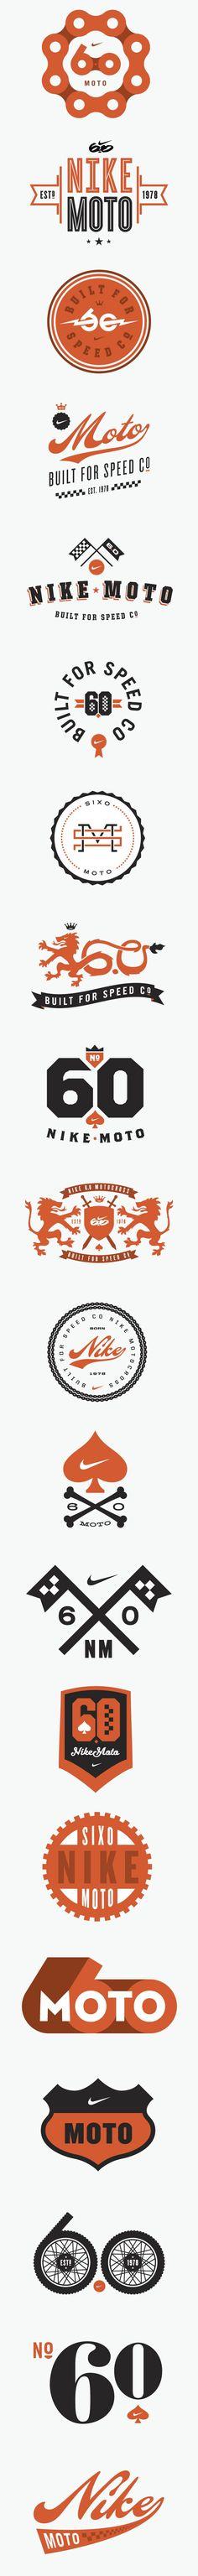 nike 6.0 motocross logos.